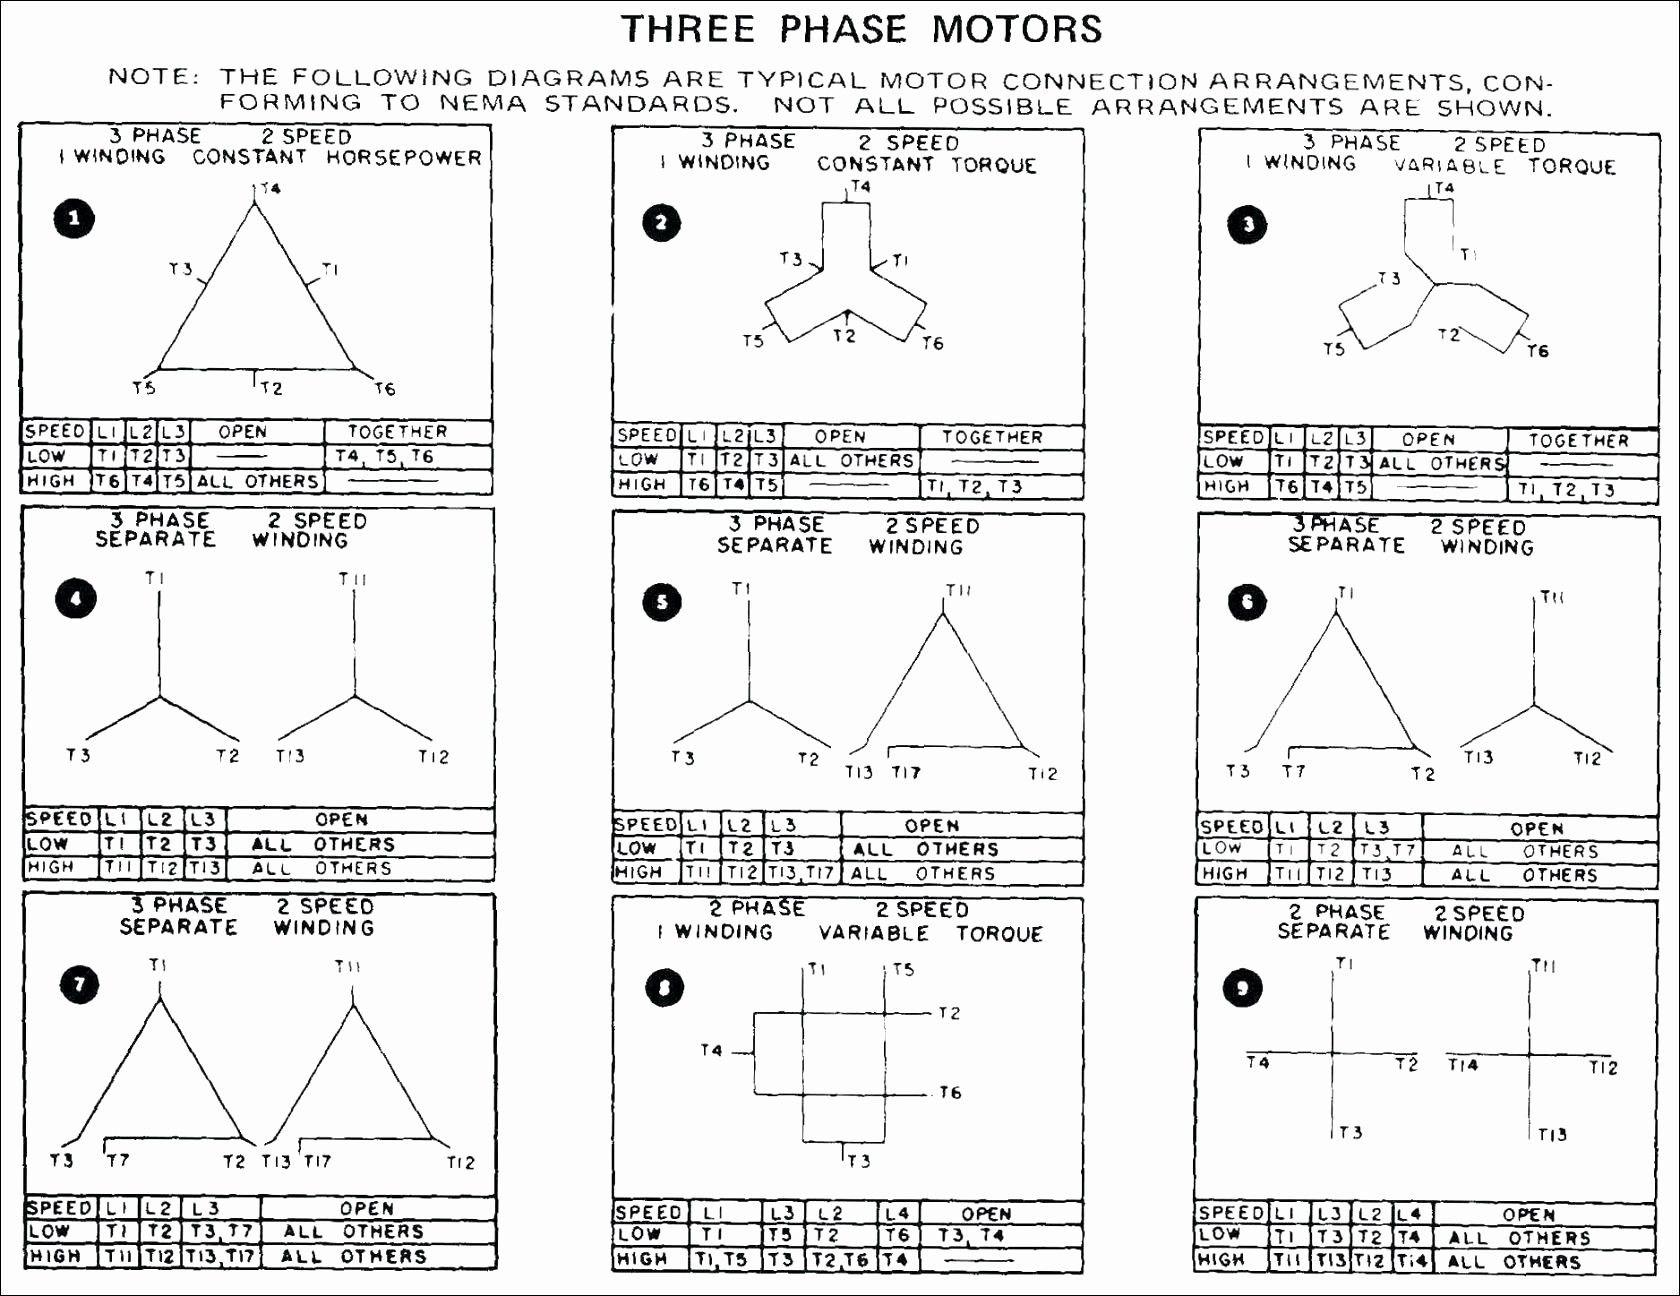 New Wiring Diagram Three Phase Generator Diagram Diagramsample Diagramtemplate Check More At Https Morningculture Co Wiring Dia Wire Diagram Diagram Chart